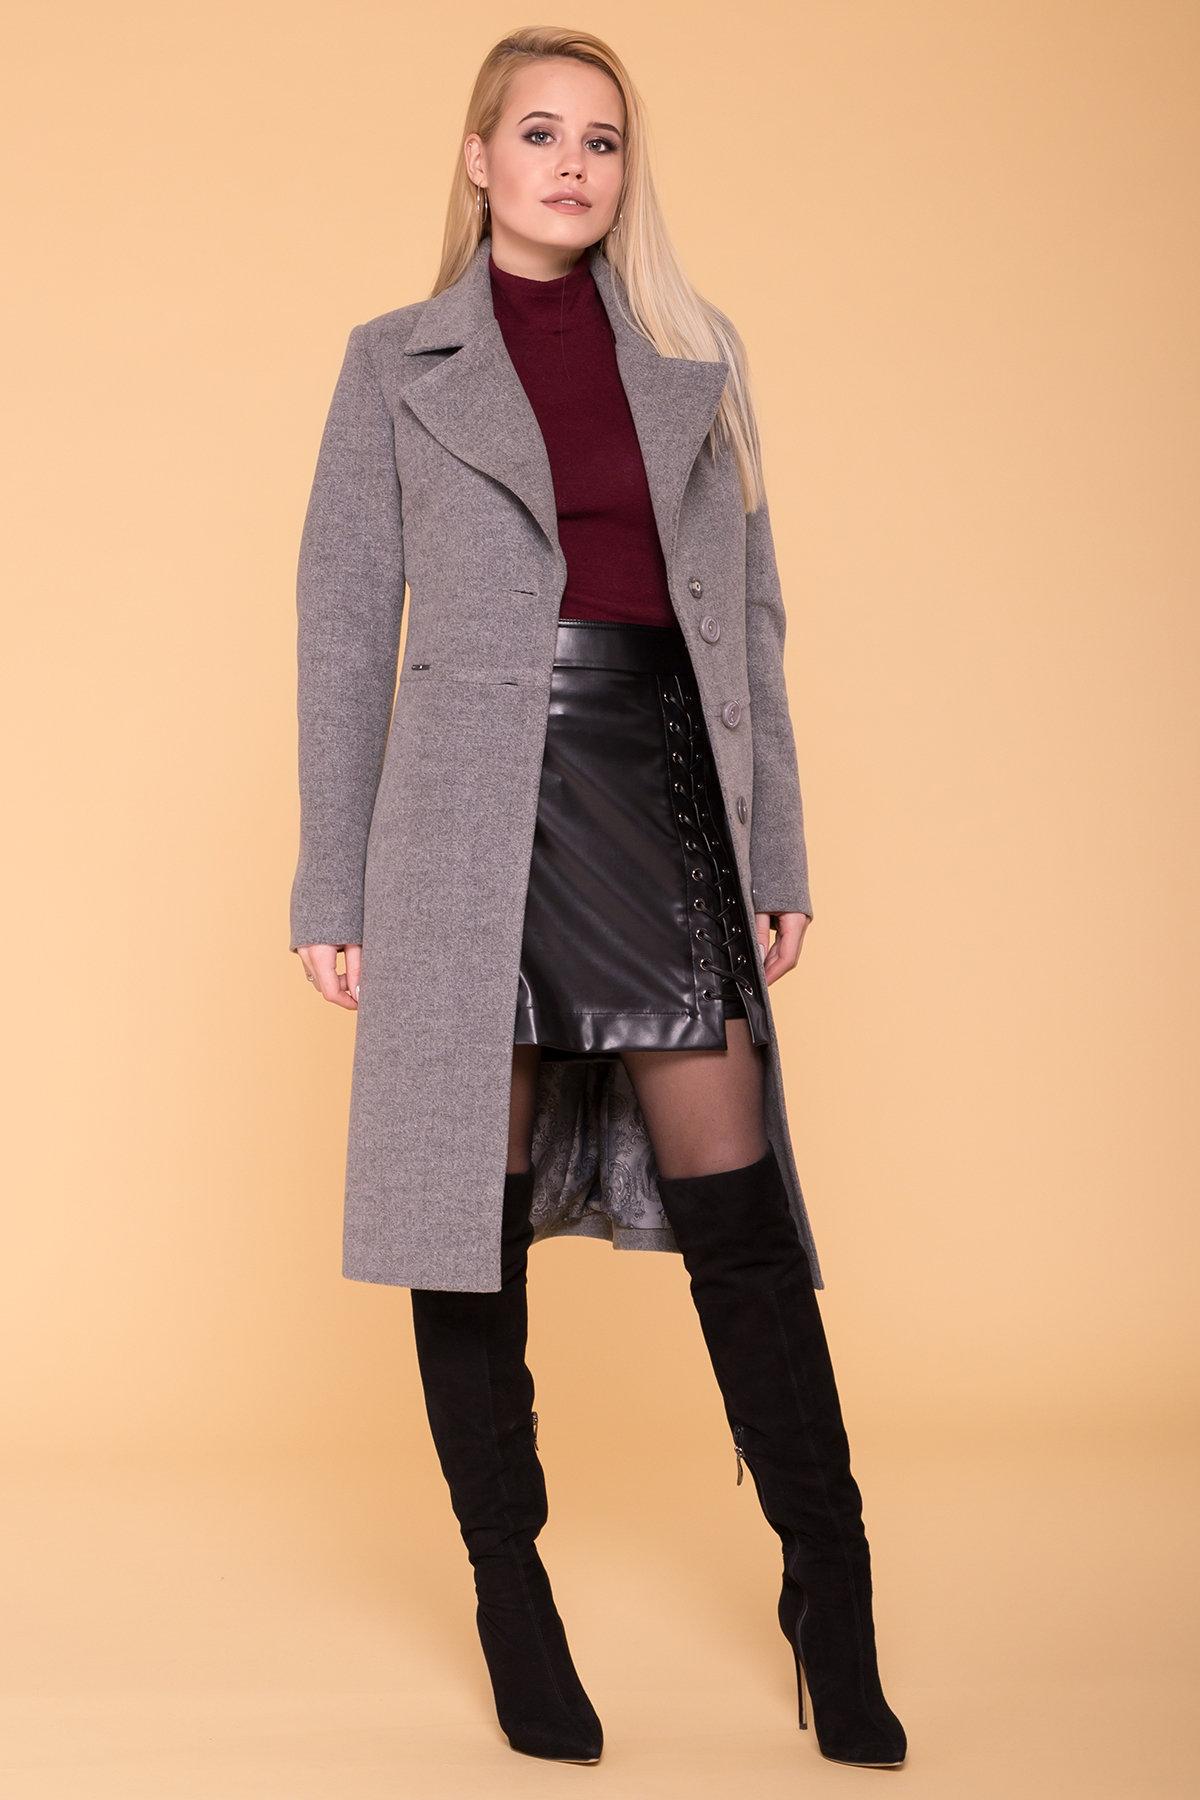 Пальто Габриэлла 7876 АРТ. 43819 Цвет: Серый 18 - фото 2, интернет магазин tm-modus.ru